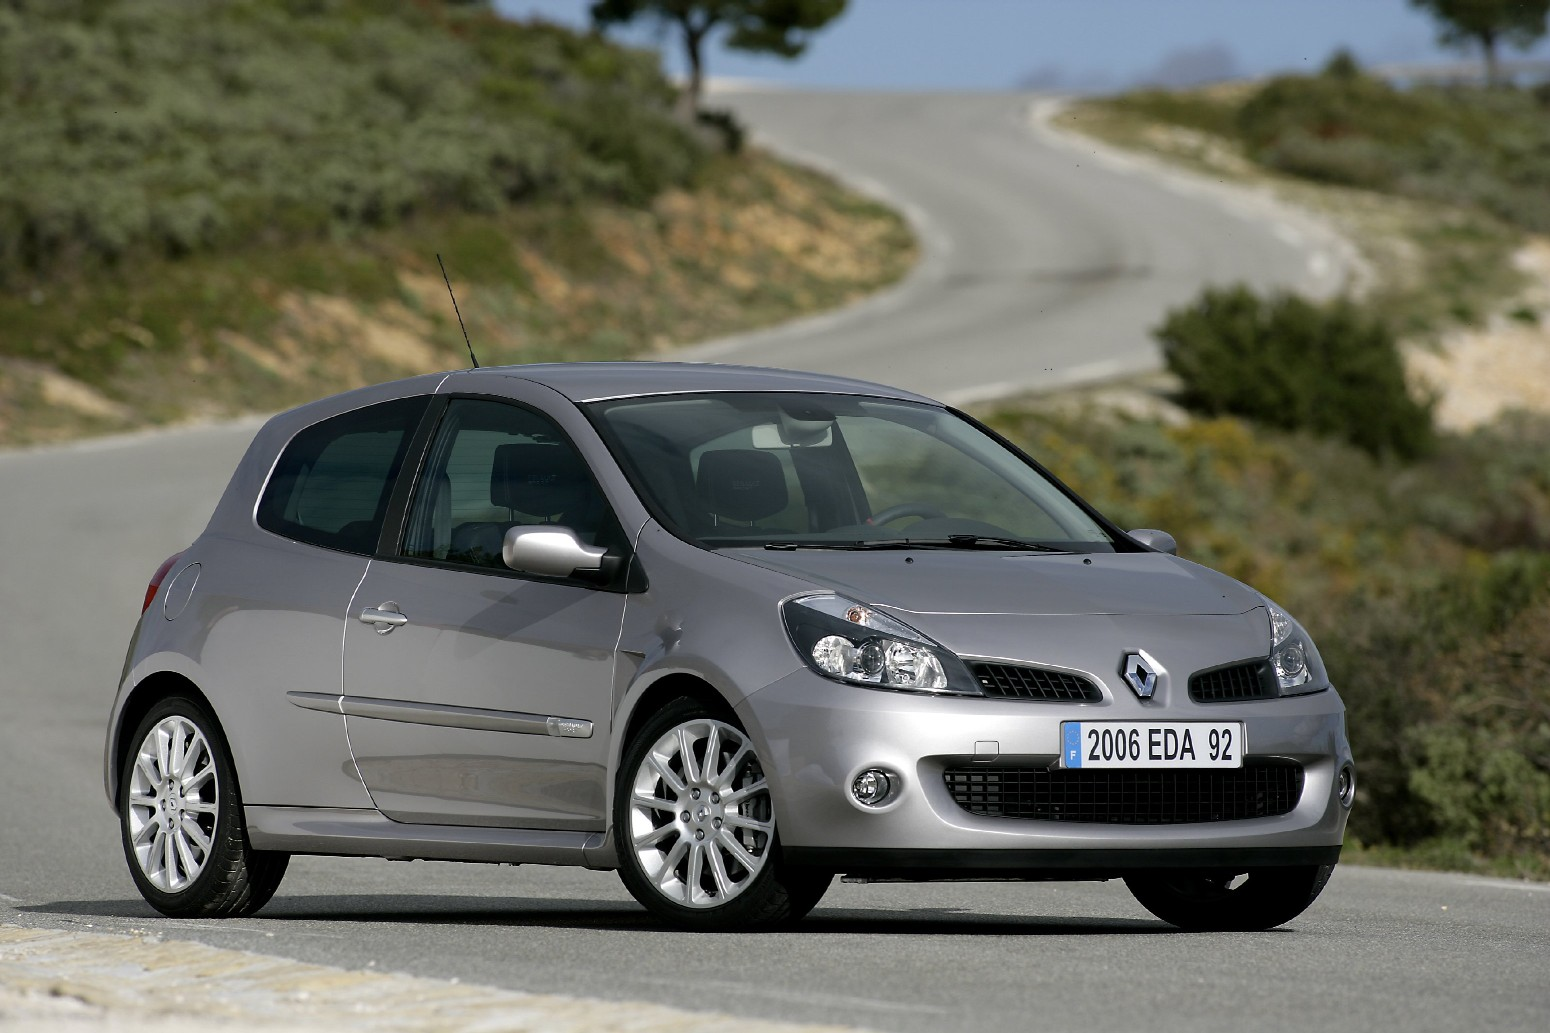 Retour sur la Clio III Renault